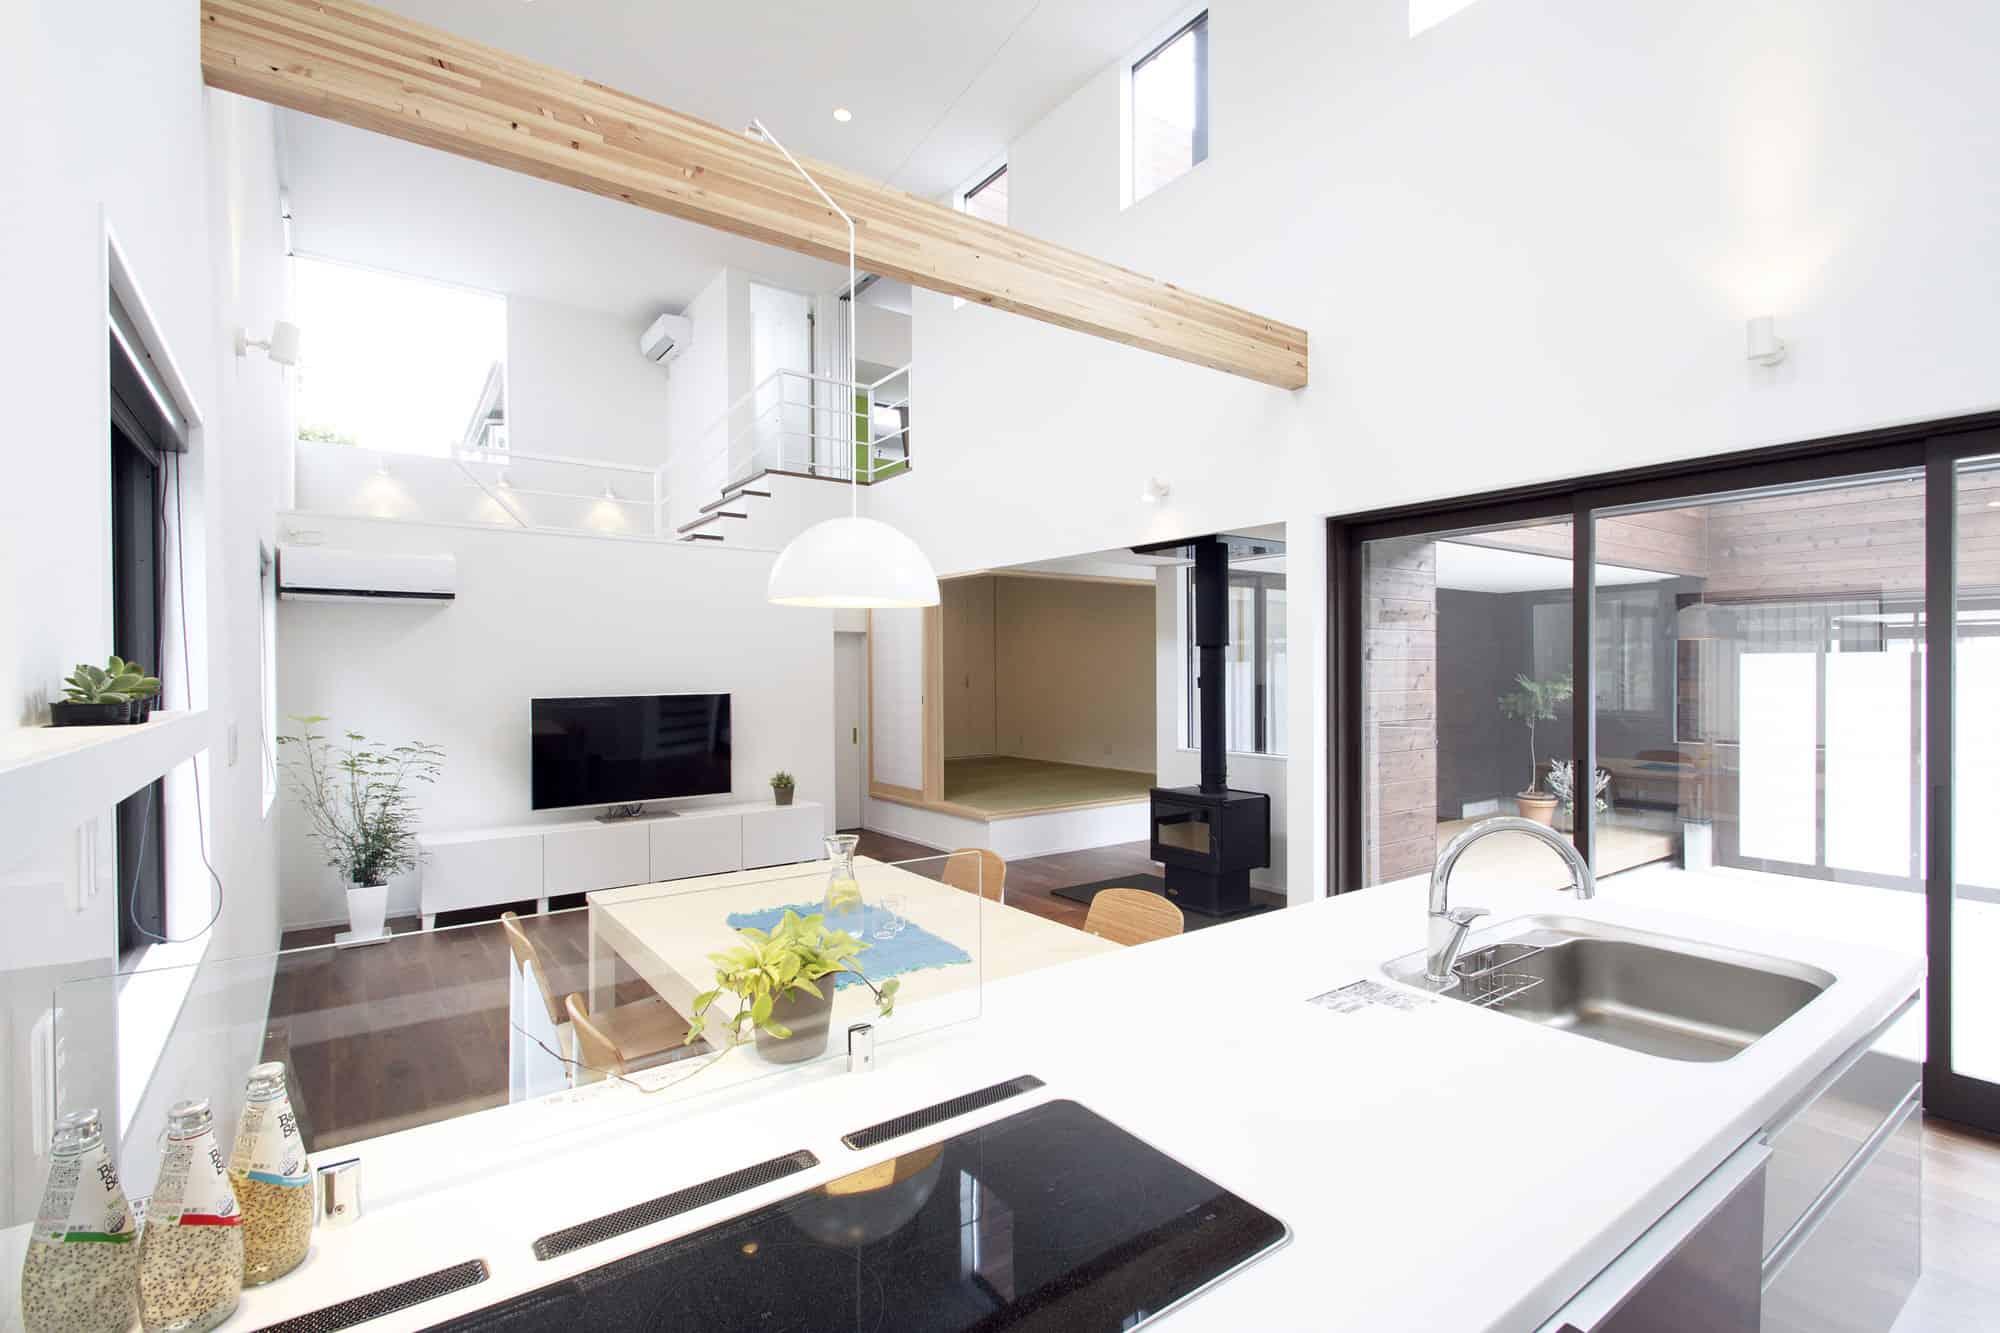 A Courtyard House by Arakawa Architects & Associates